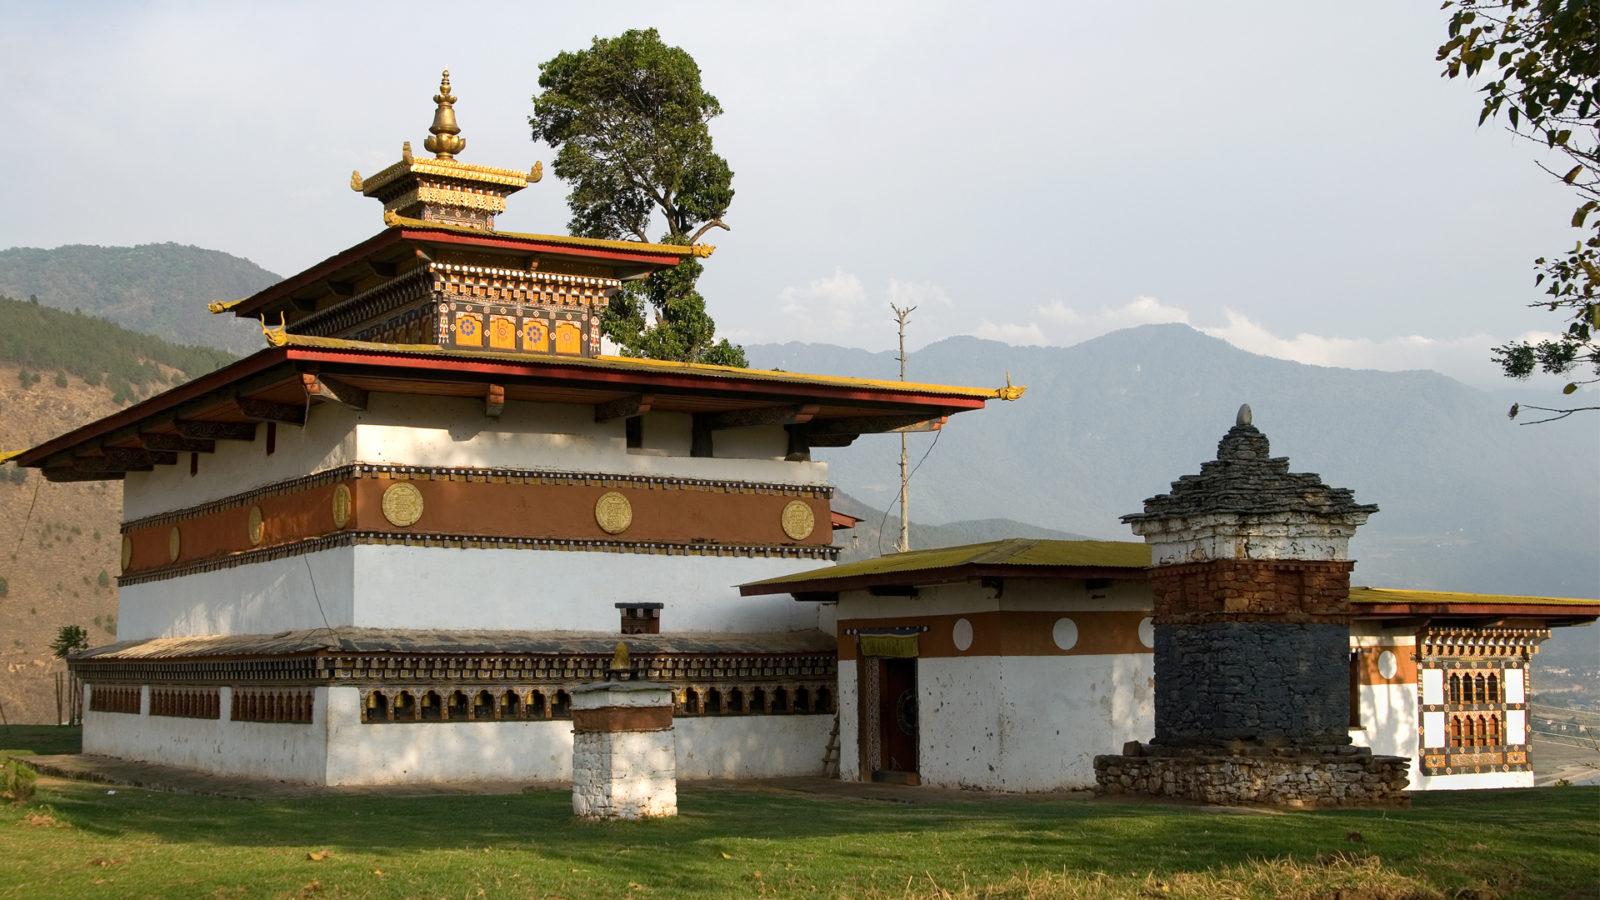 Chimi-Lhakhang-punkkha-bhutan1-1600x900.jpg